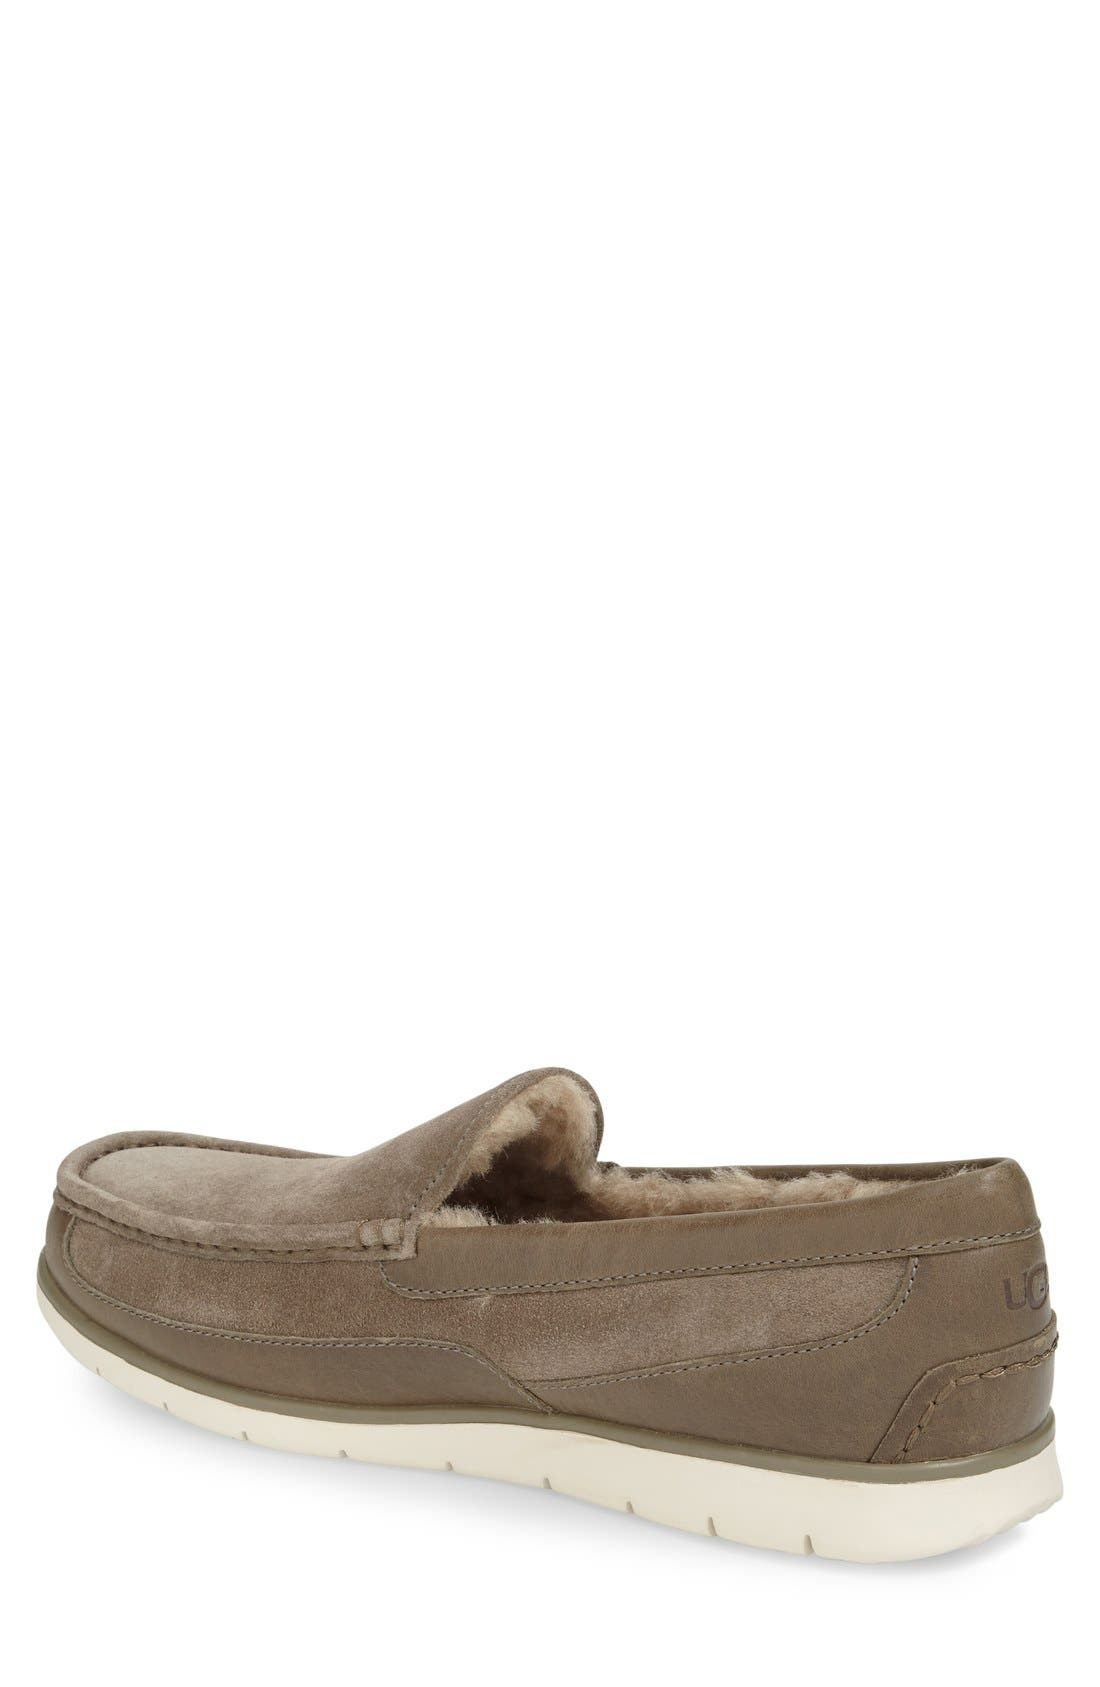 Alternate Image 2  - UGG® Fascot Driving Shoe (Men)